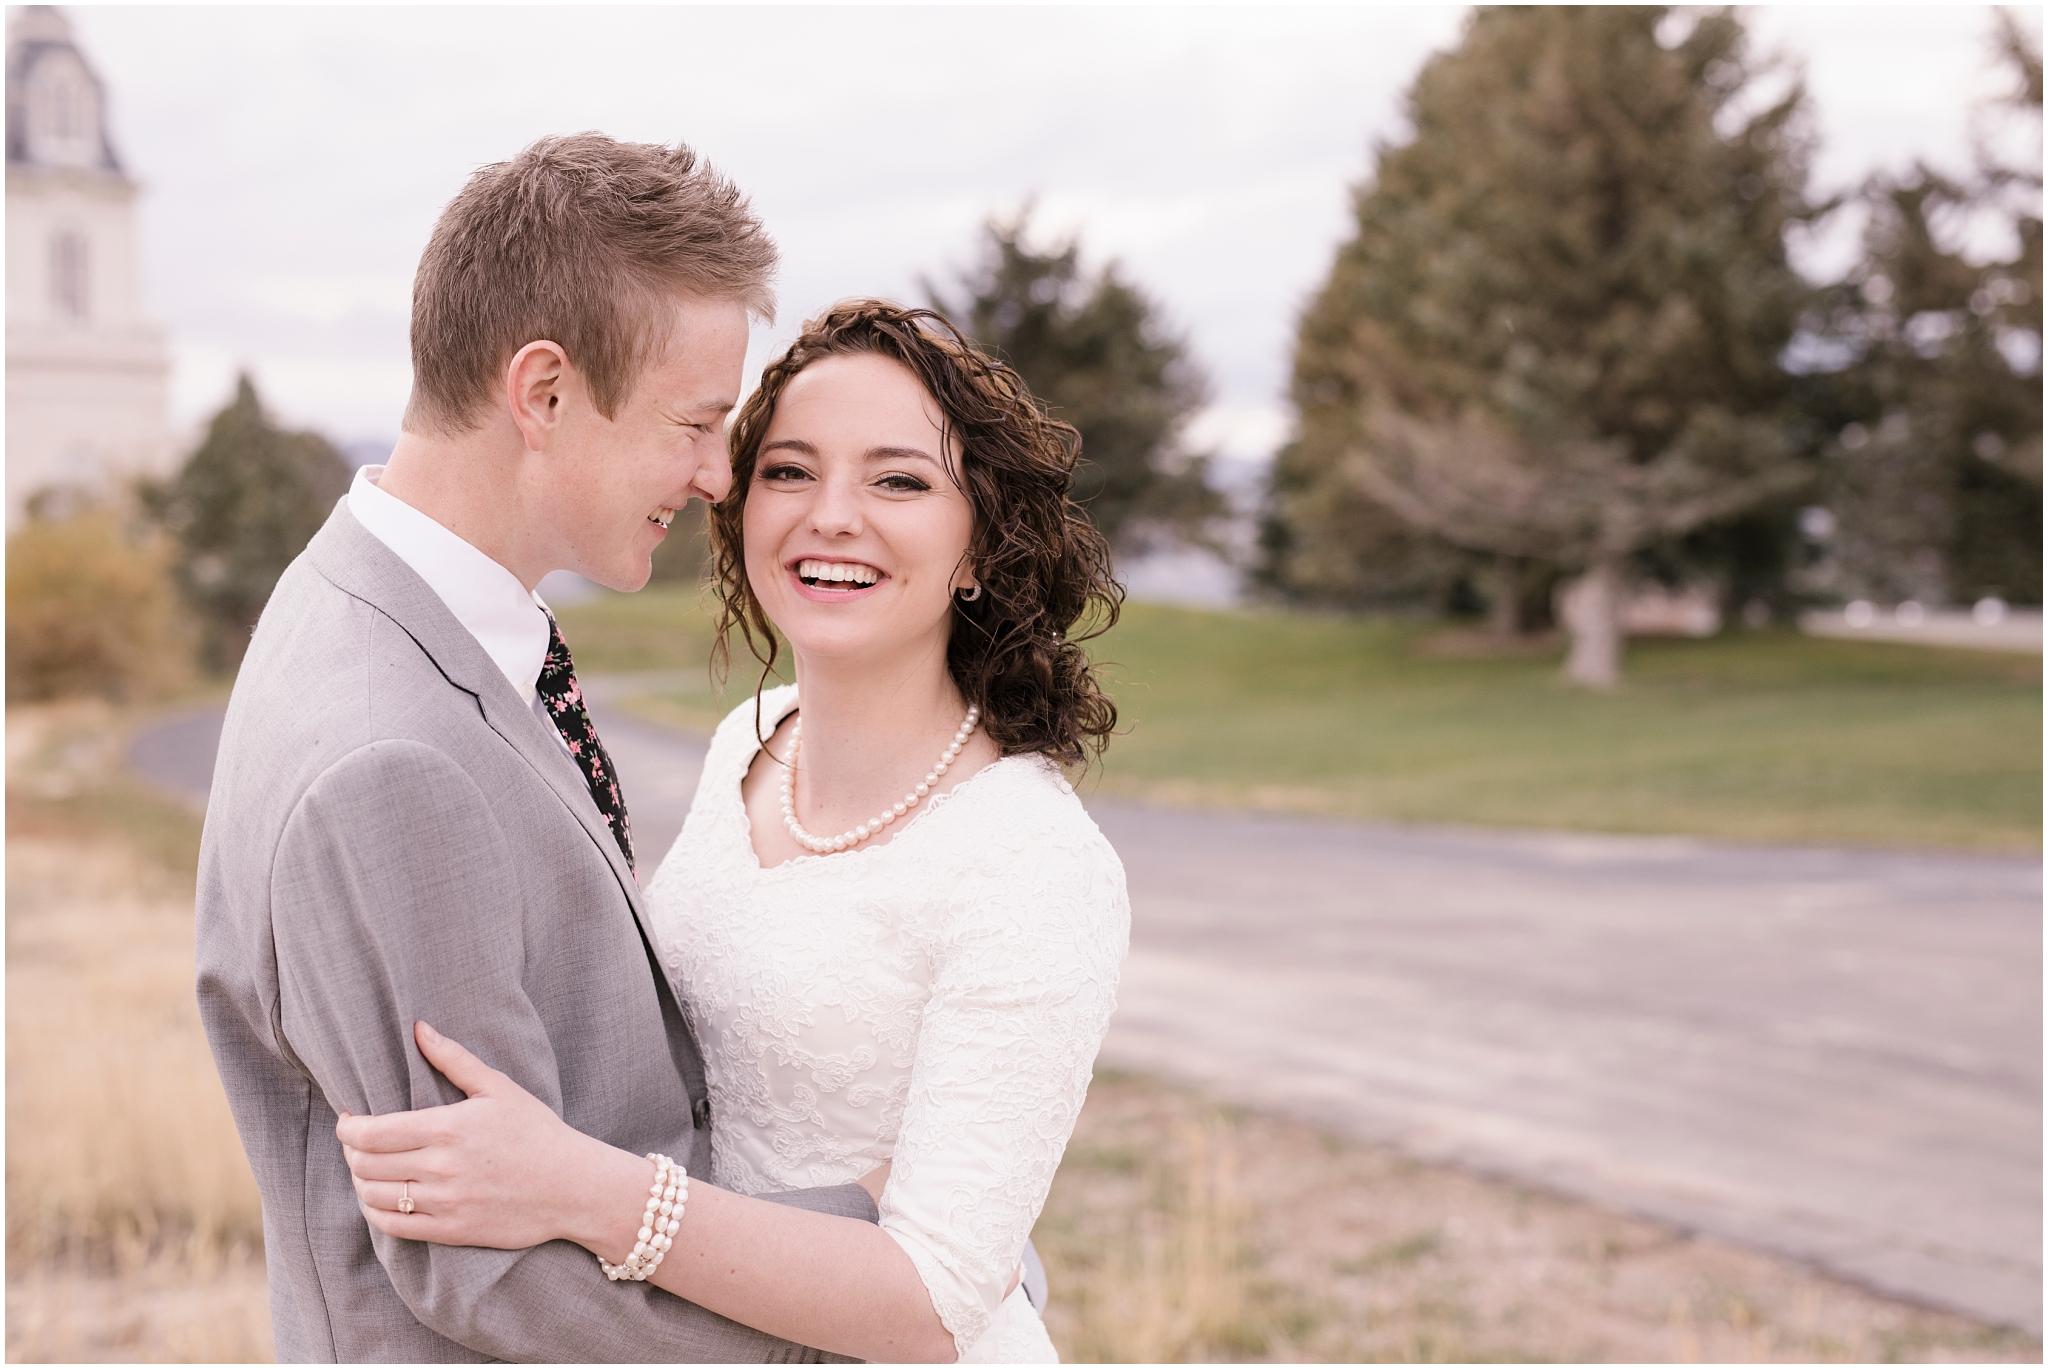 BA-Bridals-77_Lizzie-B-Imagery-Utah-Wedding-Photographer-Central-Utah-Photographer-Utah-County-Manti-Utah-Temple.jpg